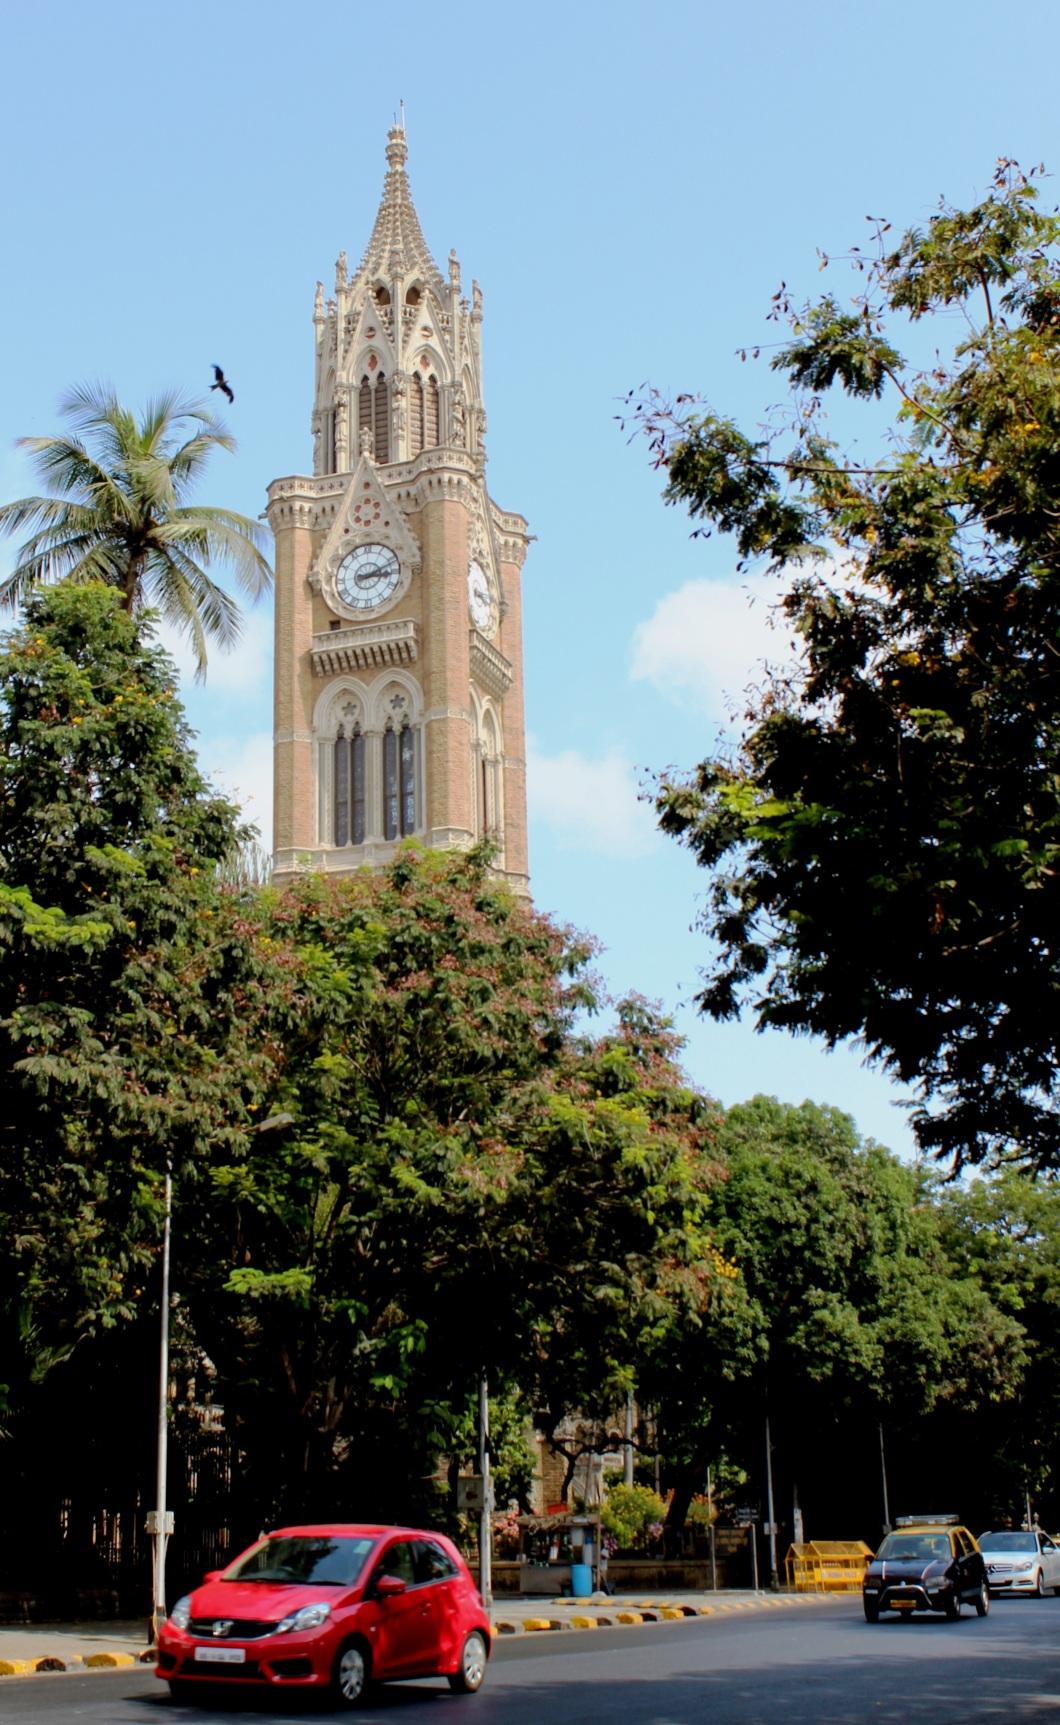 TheRajabai Clock Toweris aclock towerinSouth Mumbai, India; the tower stands at a height of 85m - Photograph in mirandavoice.com